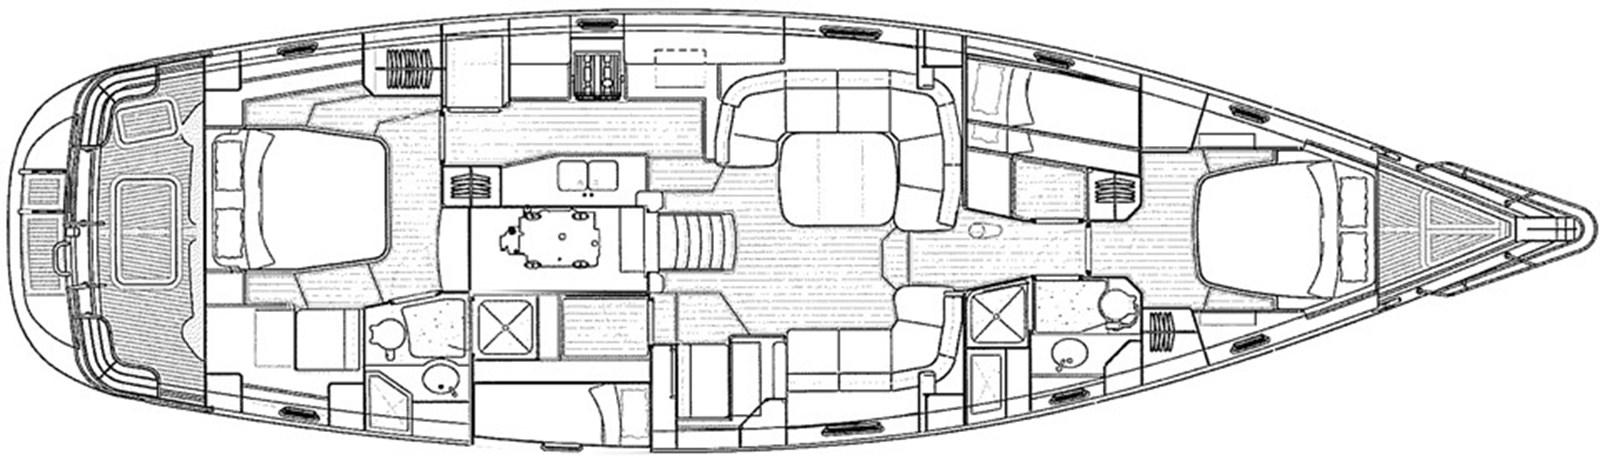 oyster-575-layout-1 2011 OYSTER MARINE LTD Oyster 575 Center Cockpit 2939051